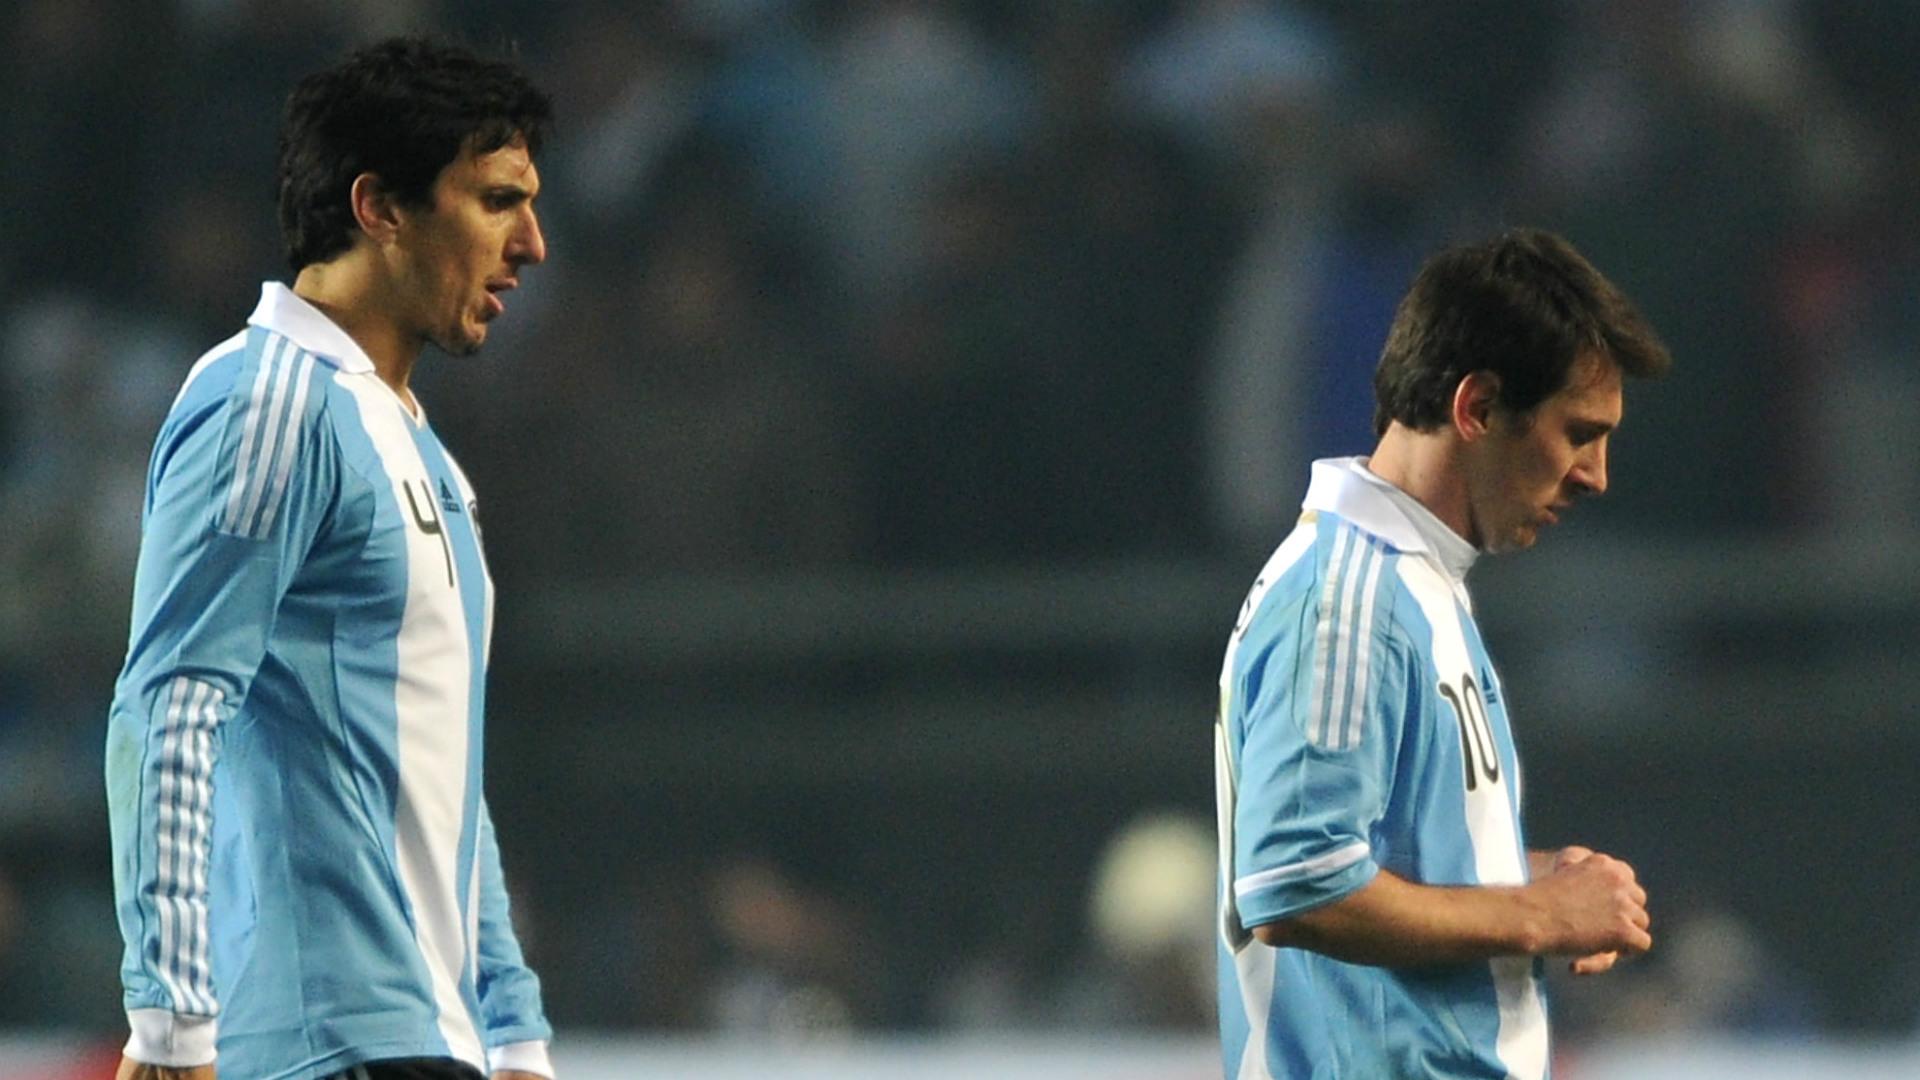 Burdisso detalló una pelea con Messi en 2011